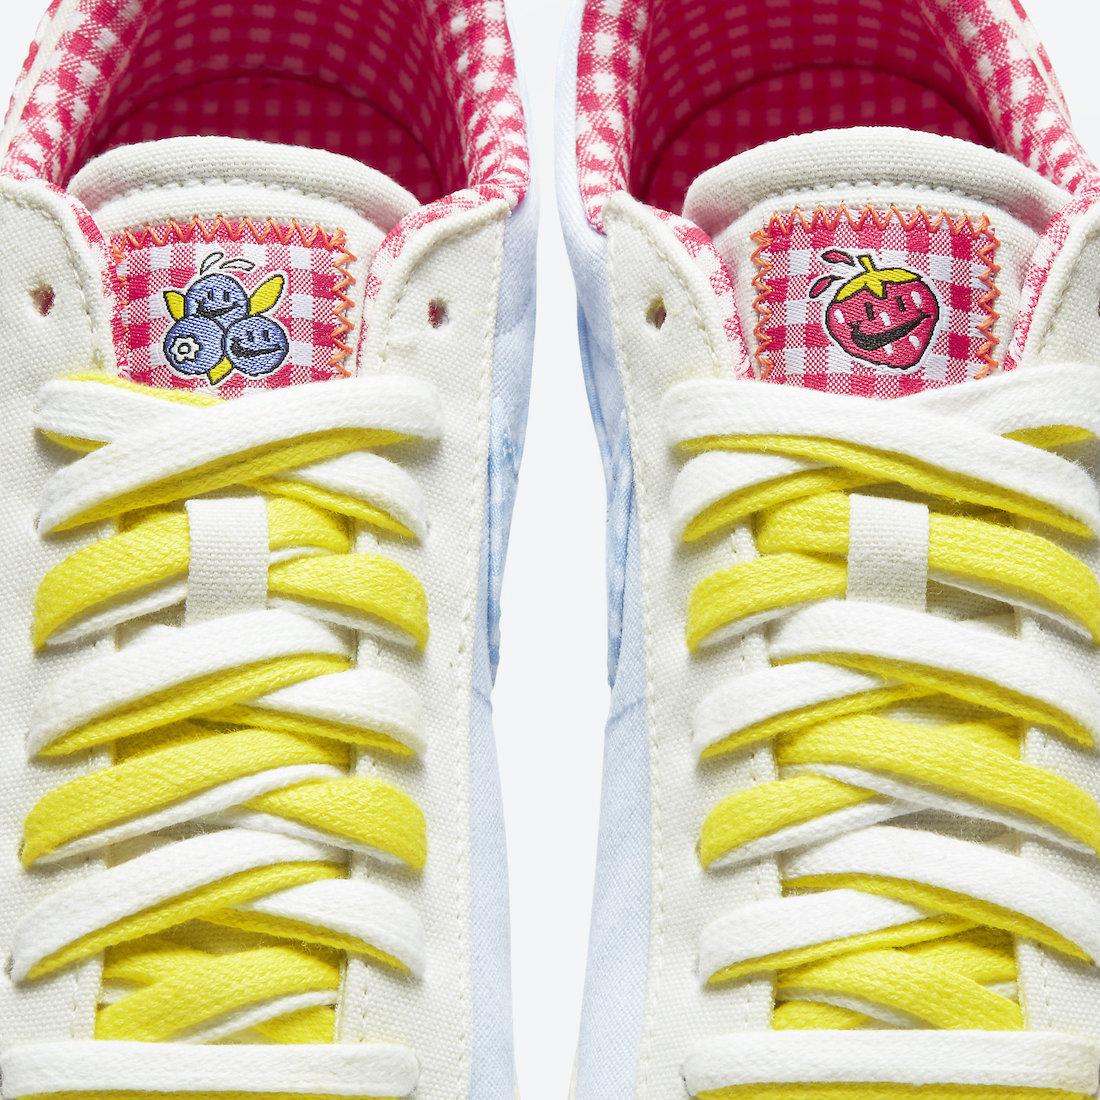 "帆布鞋, Swoosh, Nike Blazer Low LX"" Picnic"", Blazer"